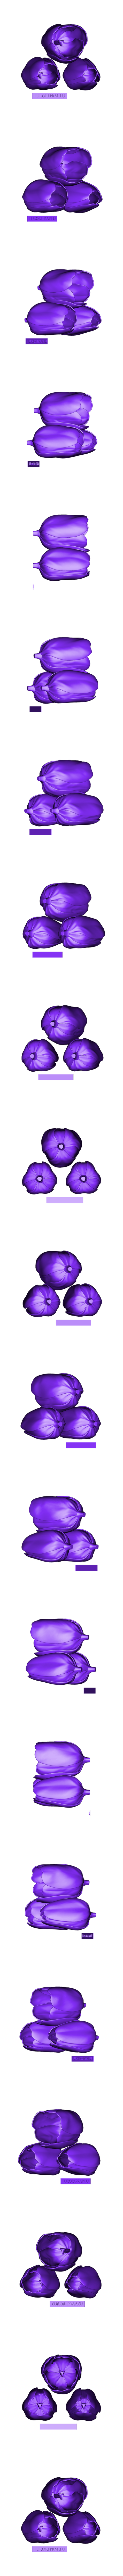 euroreprap_flower-tulip_abc.stl Download STL file flowers: Tulip - 3D printable model • 3D printable design, euroreprap_eu